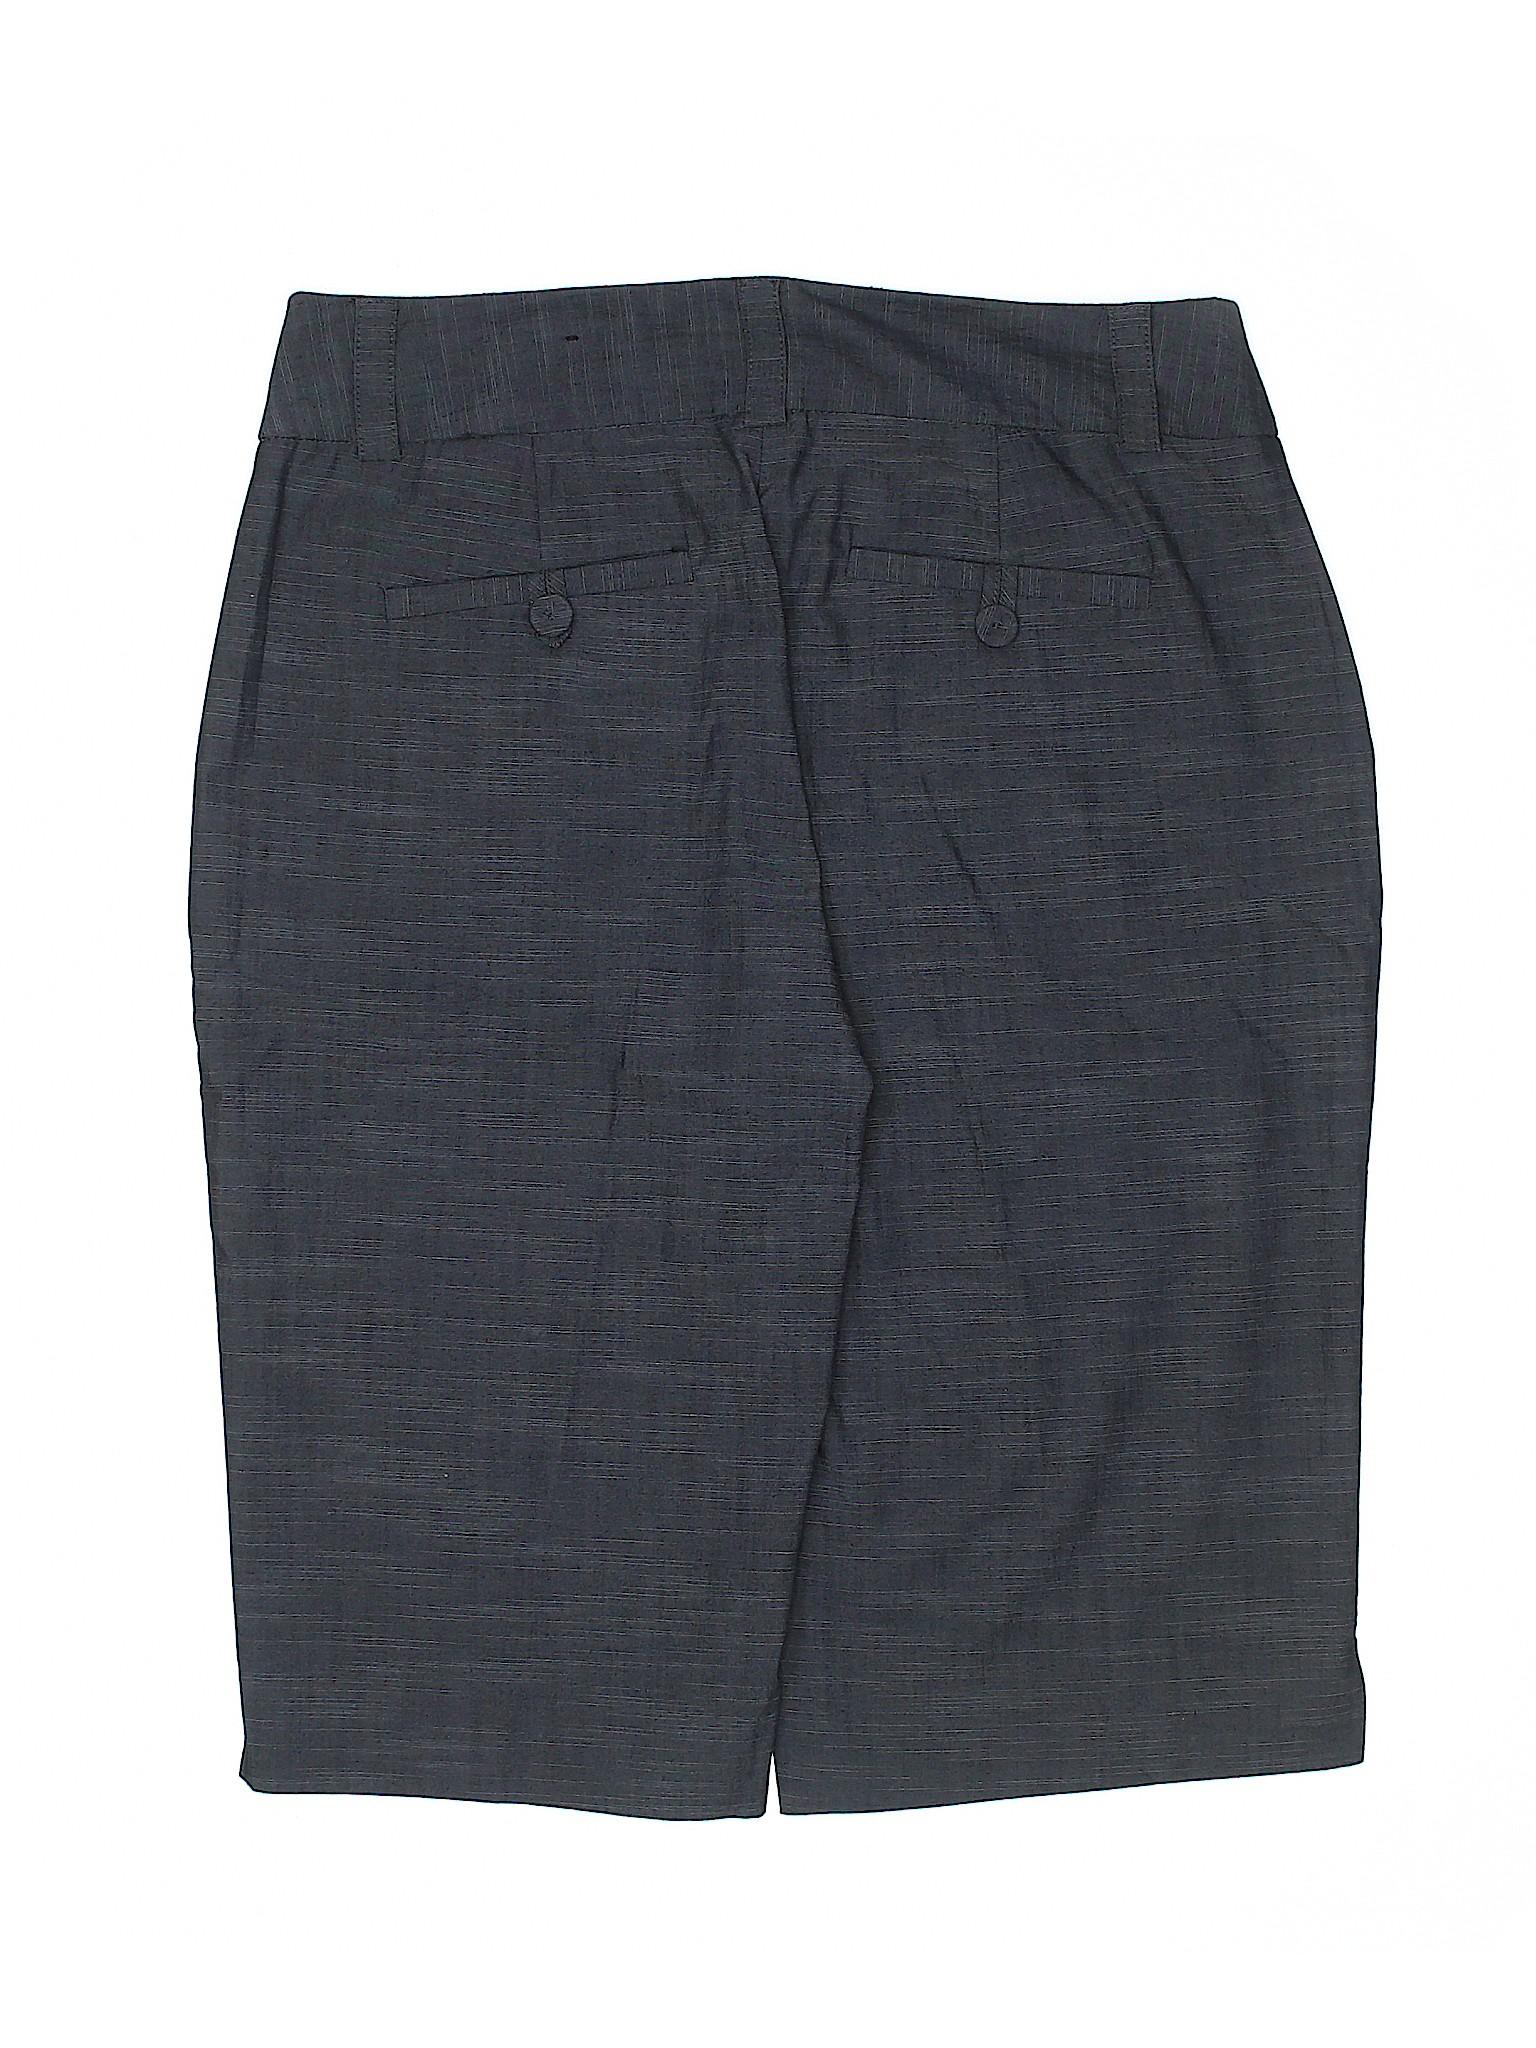 Khaki 9 Khaki Shorts Apt 9 Boutique Shorts Boutique Apt 9 Khaki Boutique Shorts Apt pqd4Un4